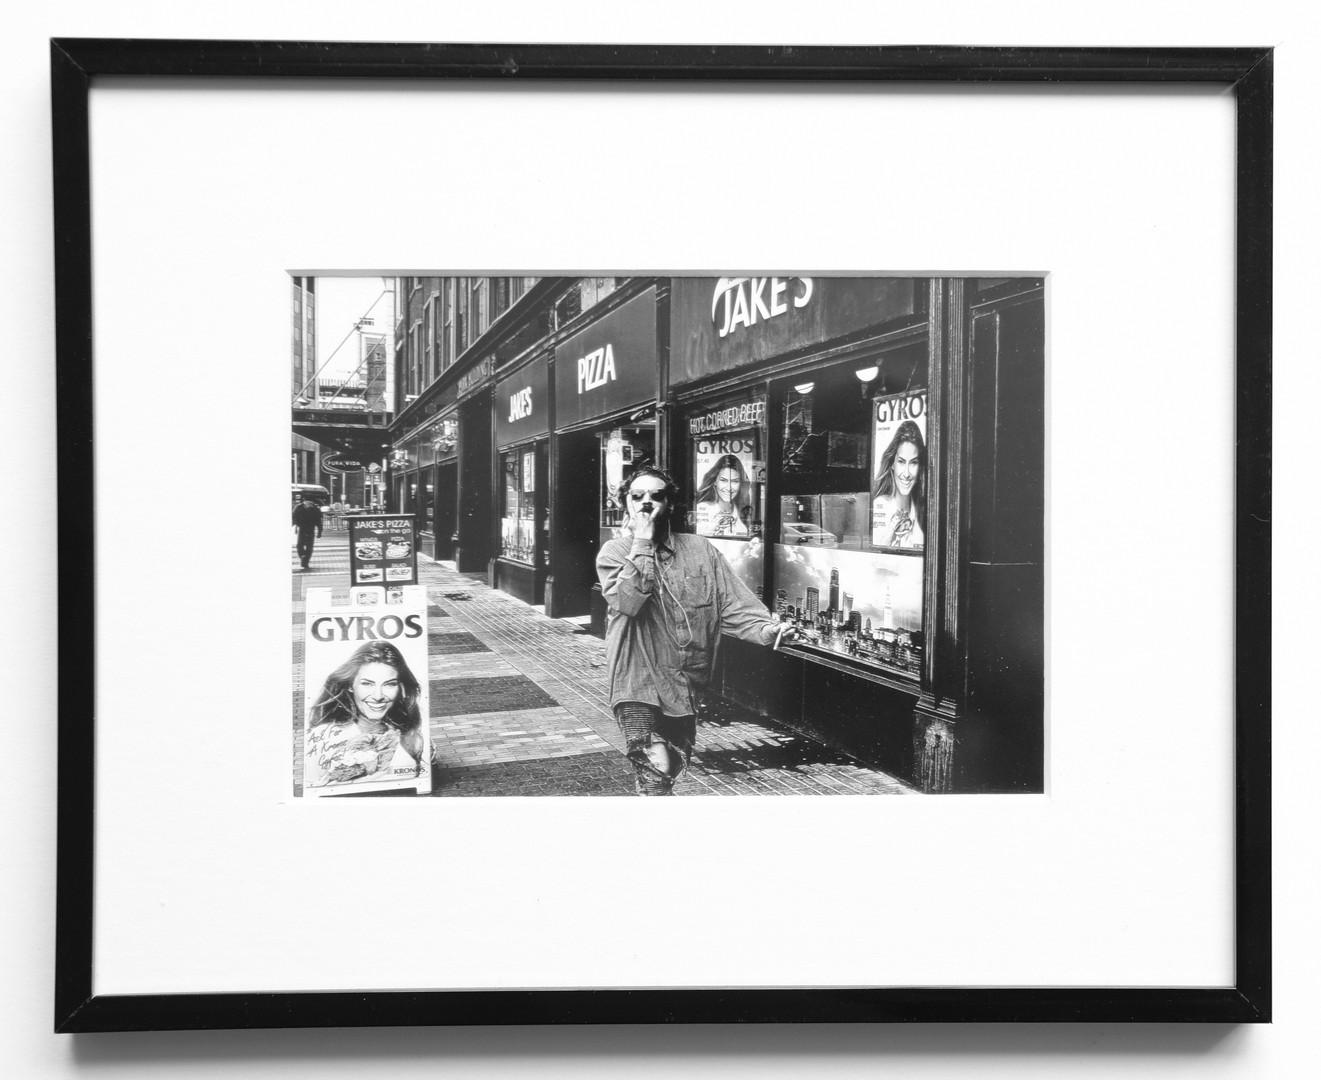 8X10 black frame 5X7 photo 5X7 white mat